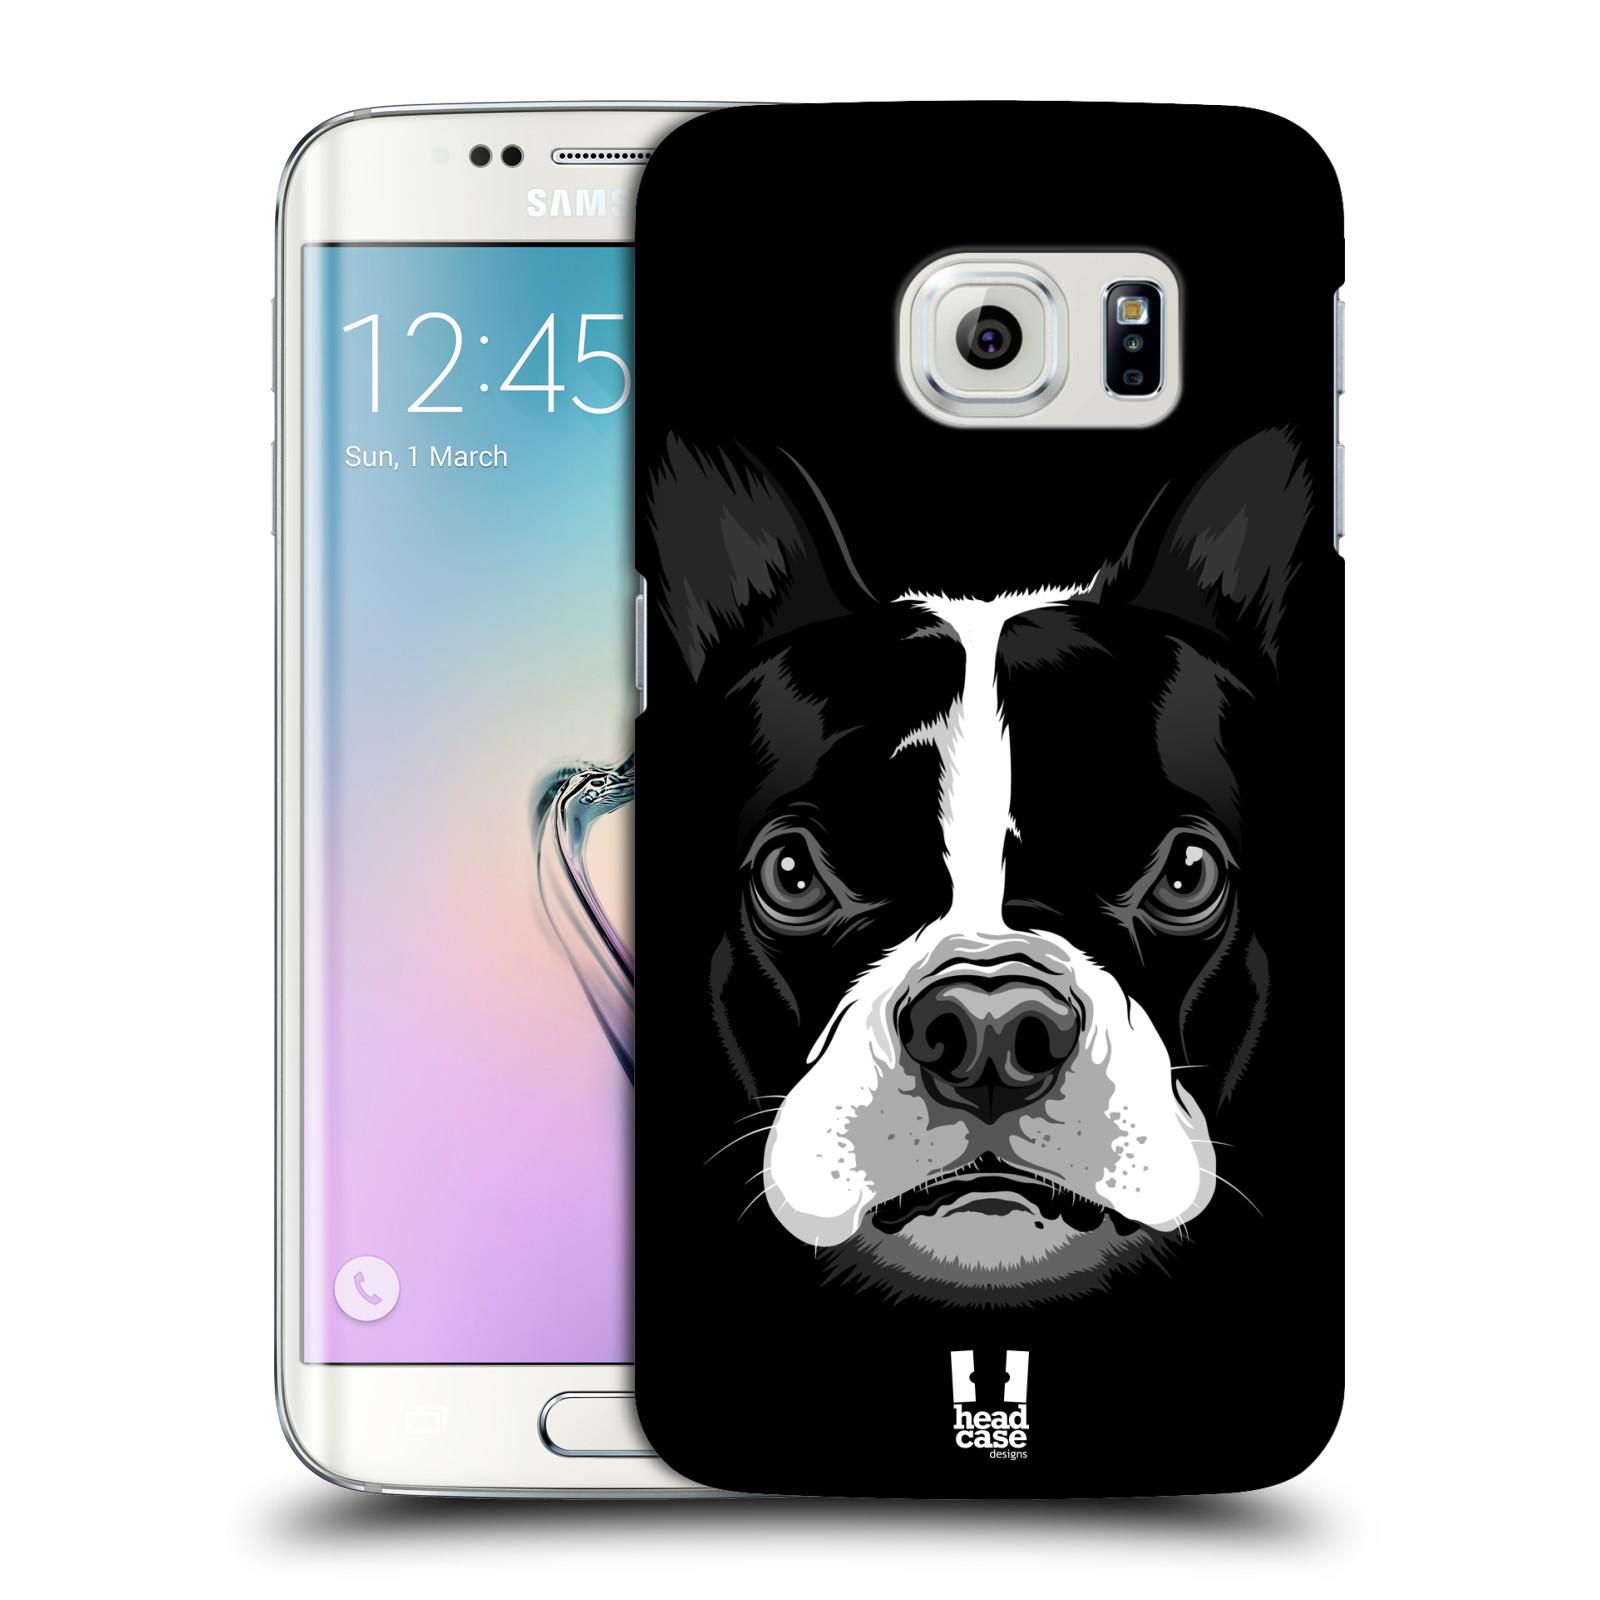 HEAD CASE plastový obal na mobil SAMSUNG Galaxy S6 EDGE (G9250, G925, G925F) vzor Zvíře kreslená tvář 2 buldok